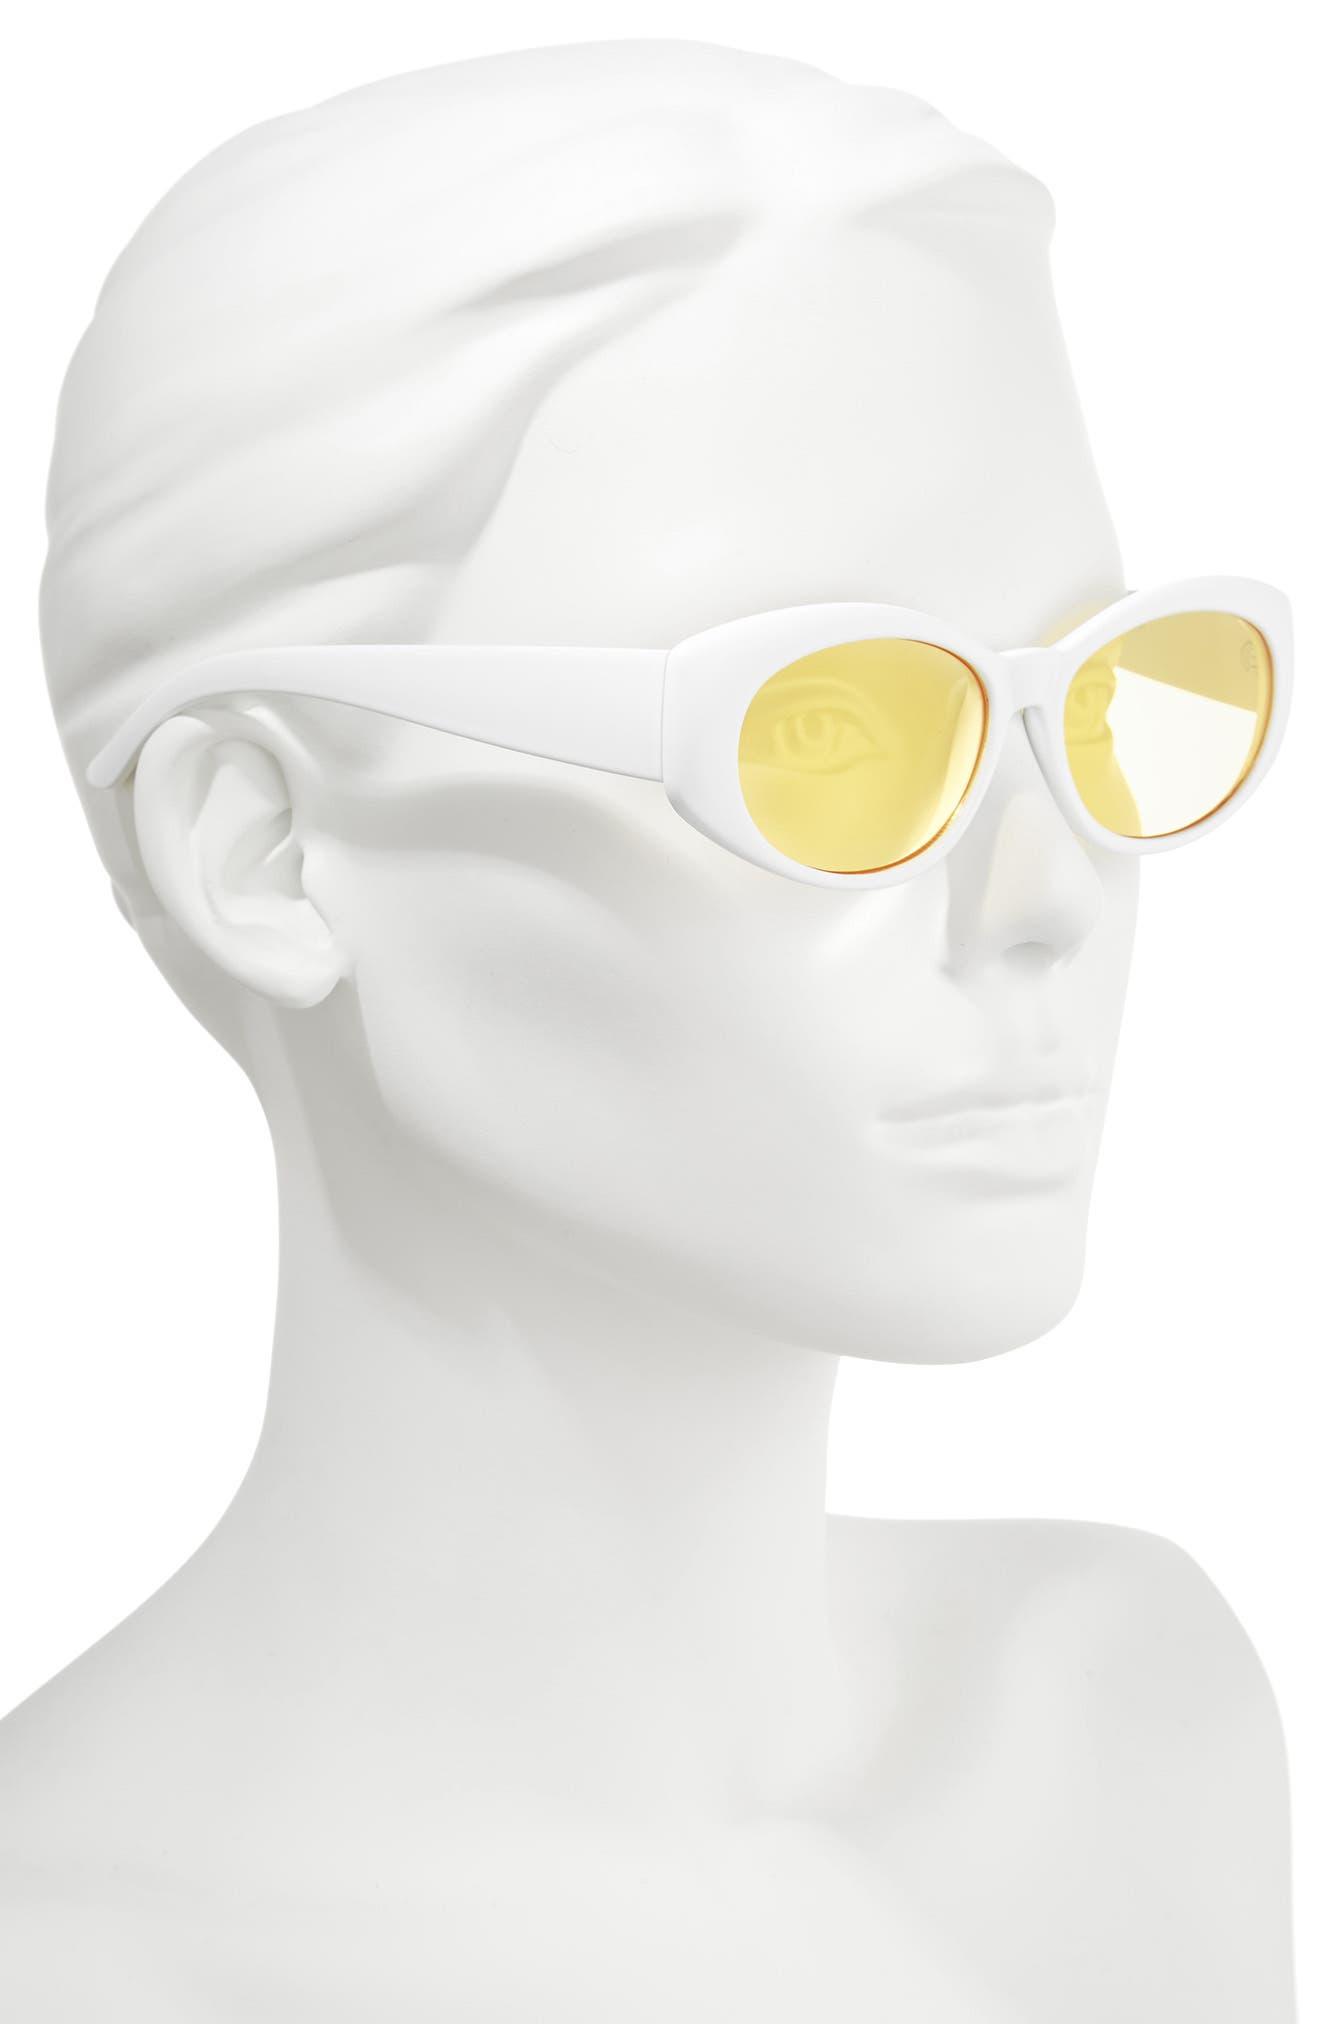 68mm Oval Sunglasses,                             Alternate thumbnail 2, color,                             102